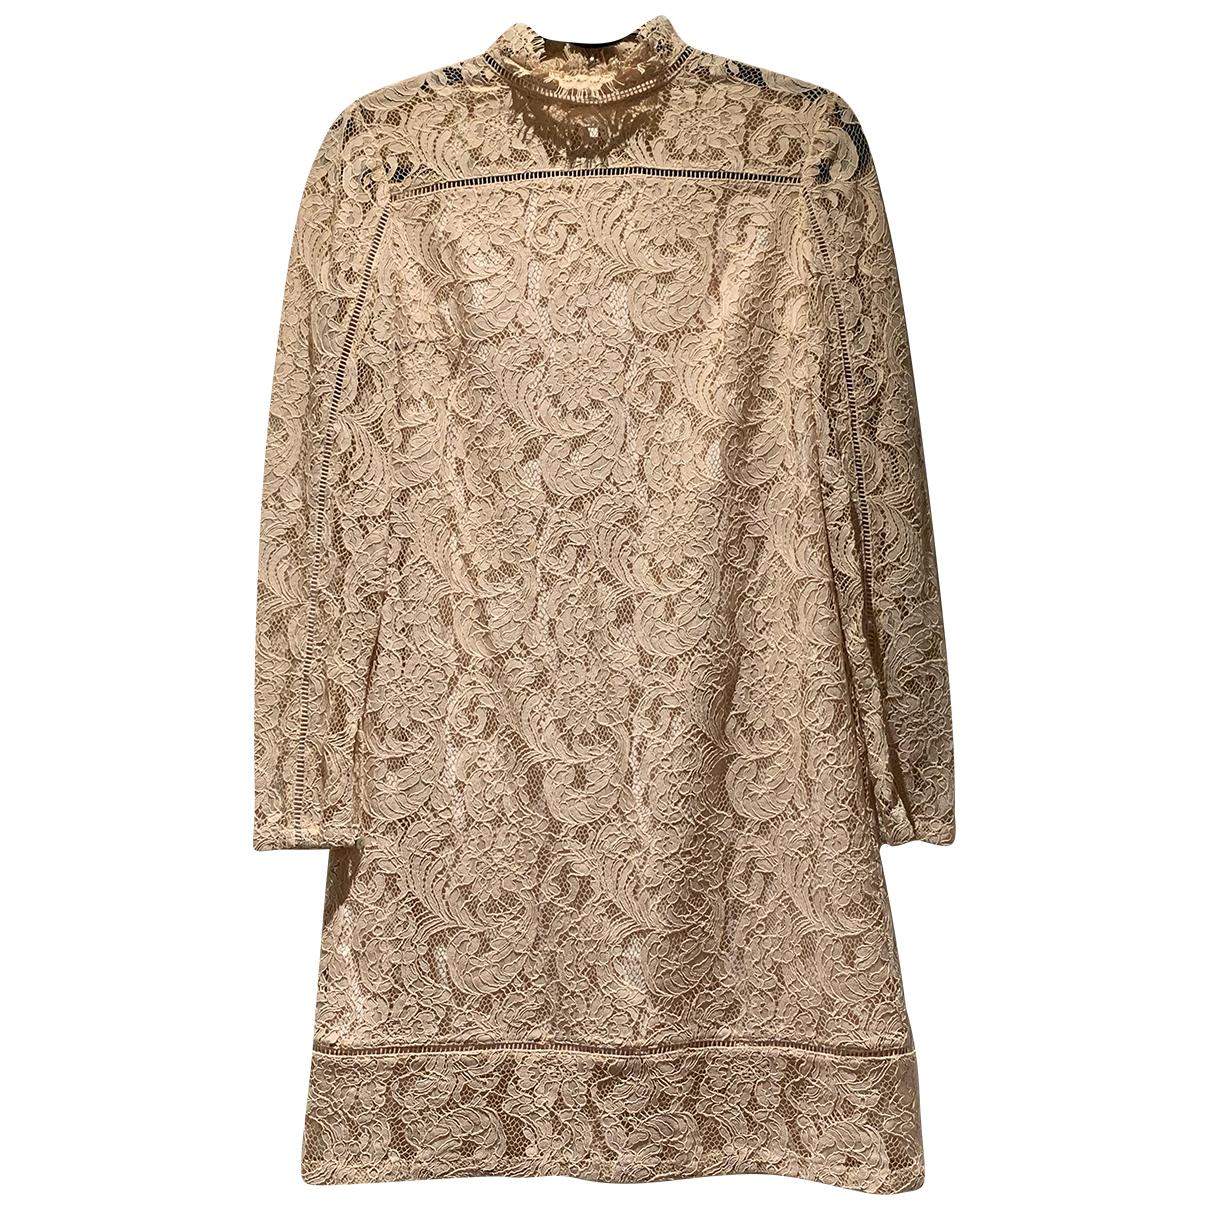 Reiss N Pink Lace dress for Women 10 UK